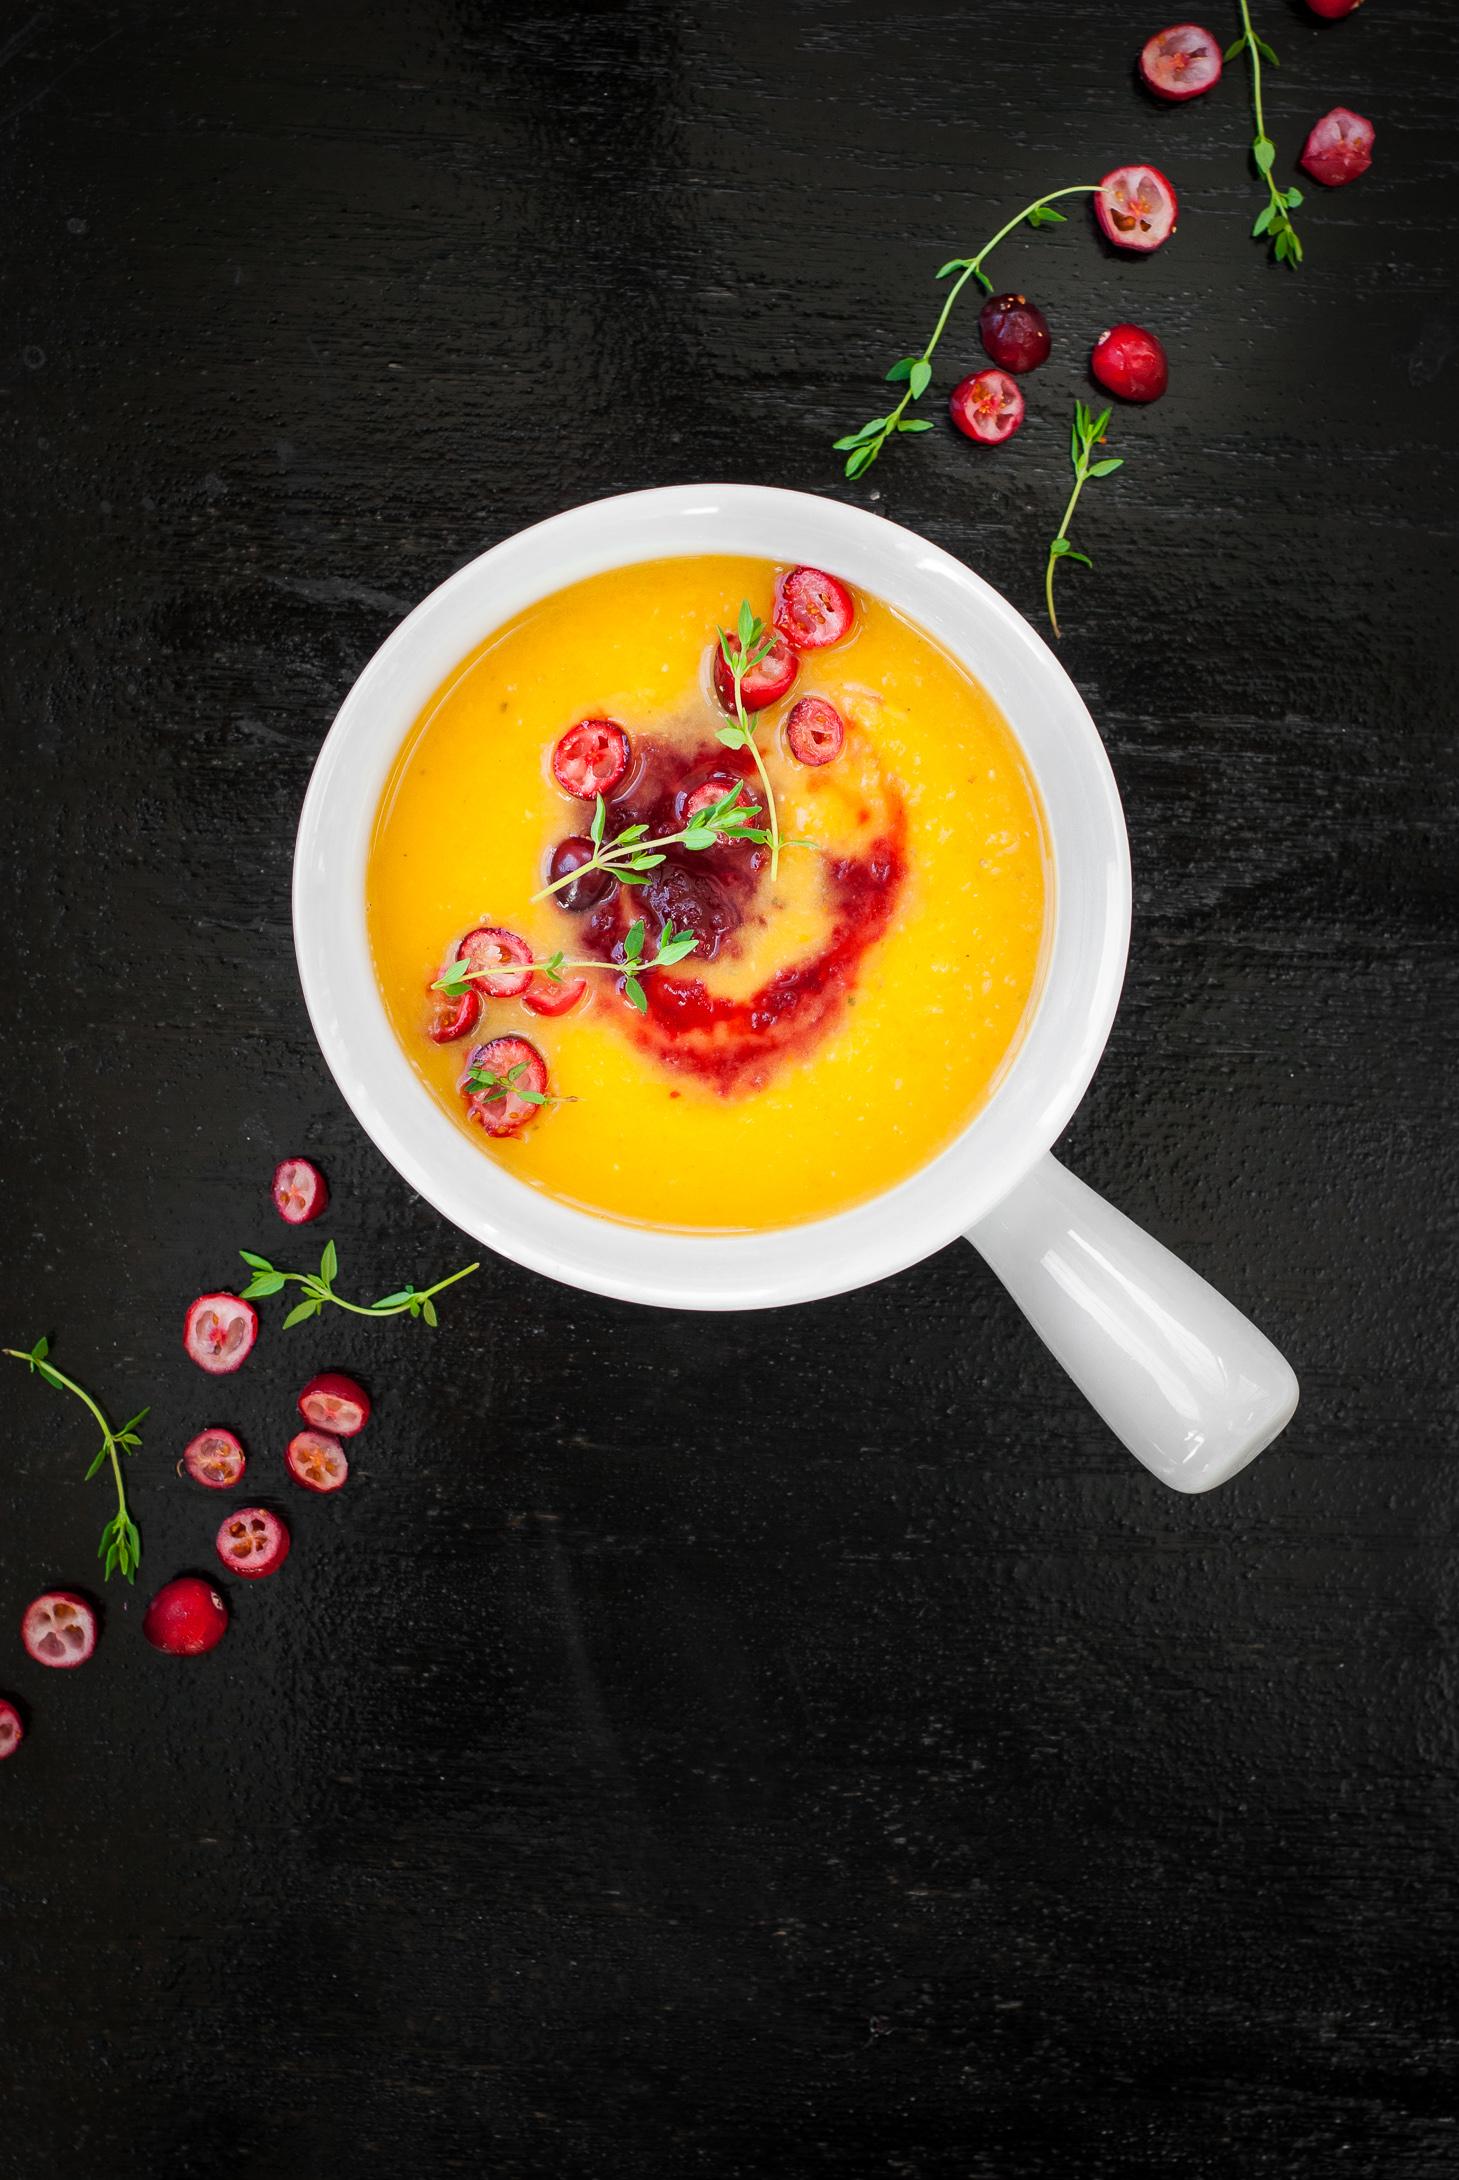 Butternut Squash Soup with Cranberry Apple Swirl | kumquatblog.com @kumquatblog recipe